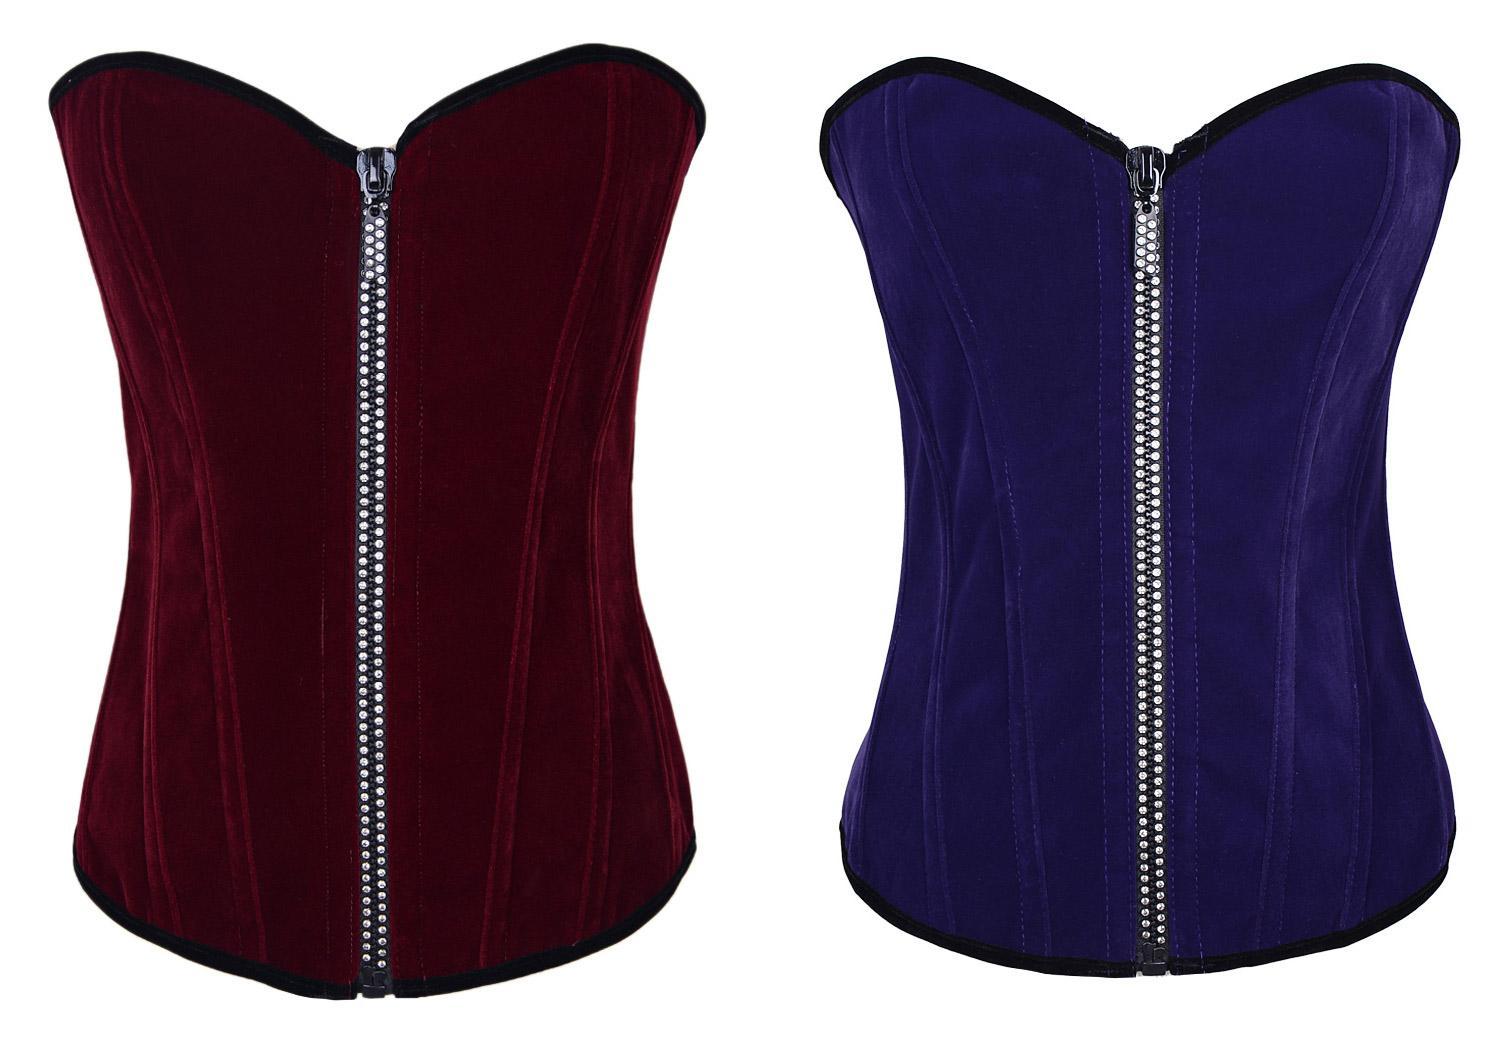 2019 Classic Velvet Overbust Corset Features Zipper Front